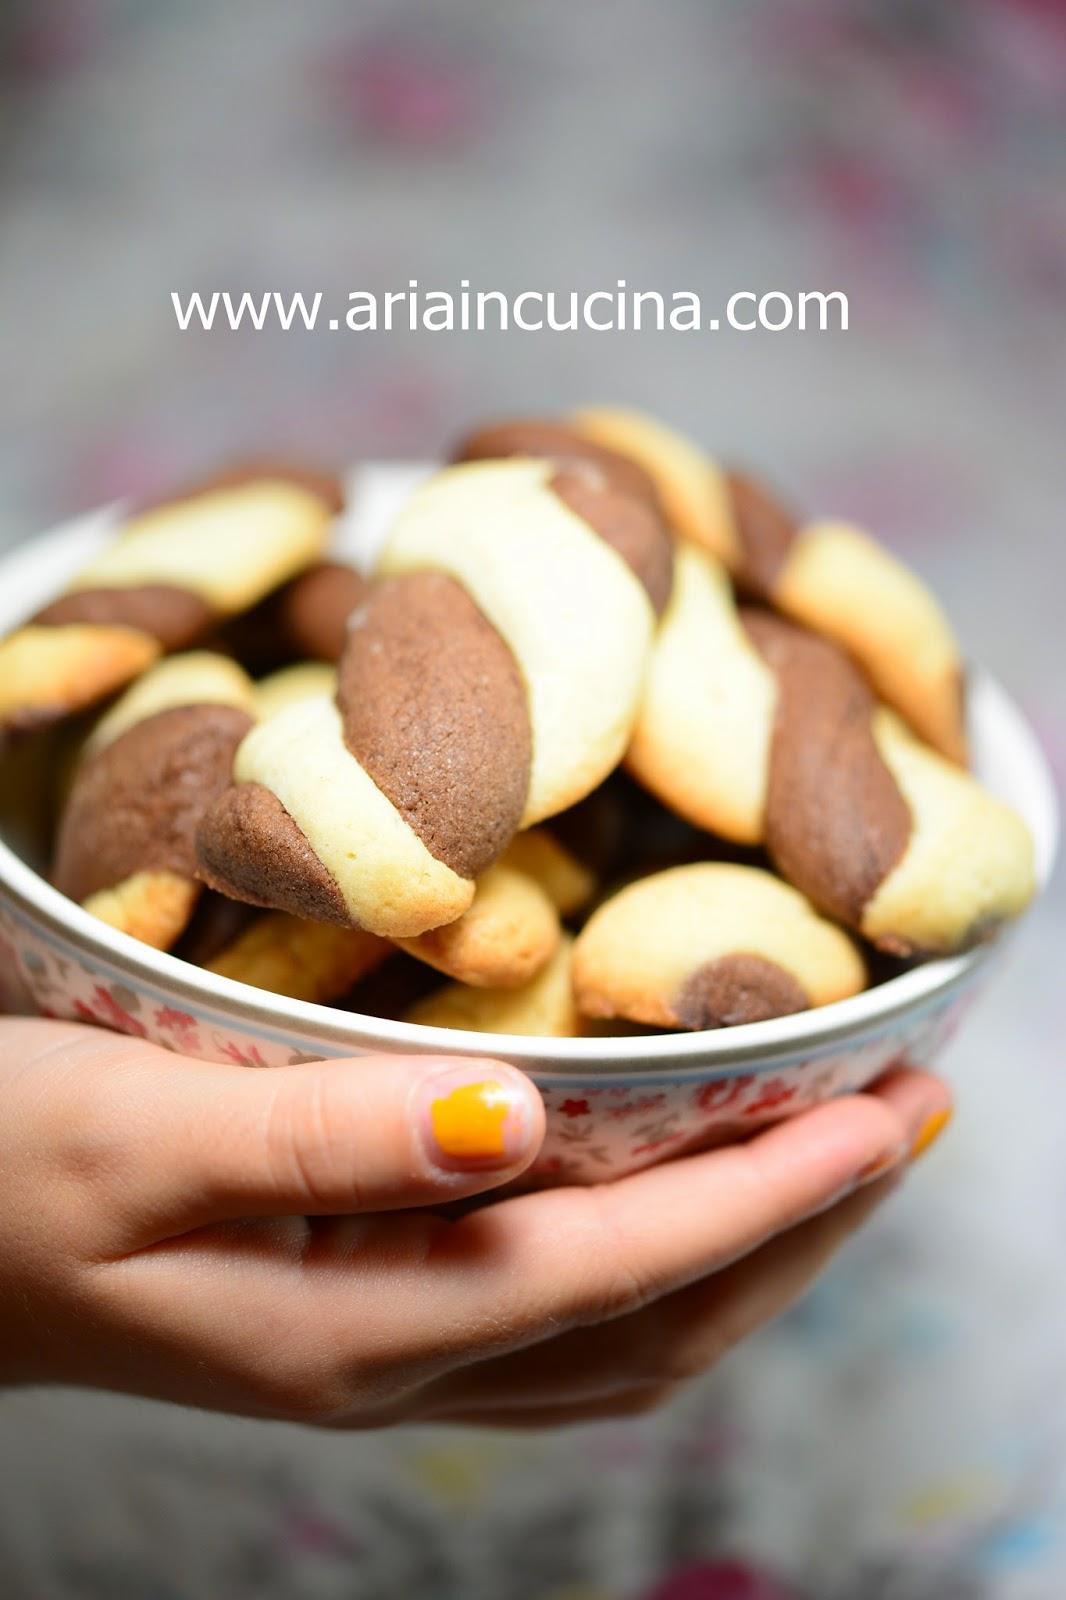 Blog di cucina di Aria: Biscotti treccine vaniglia e cacao